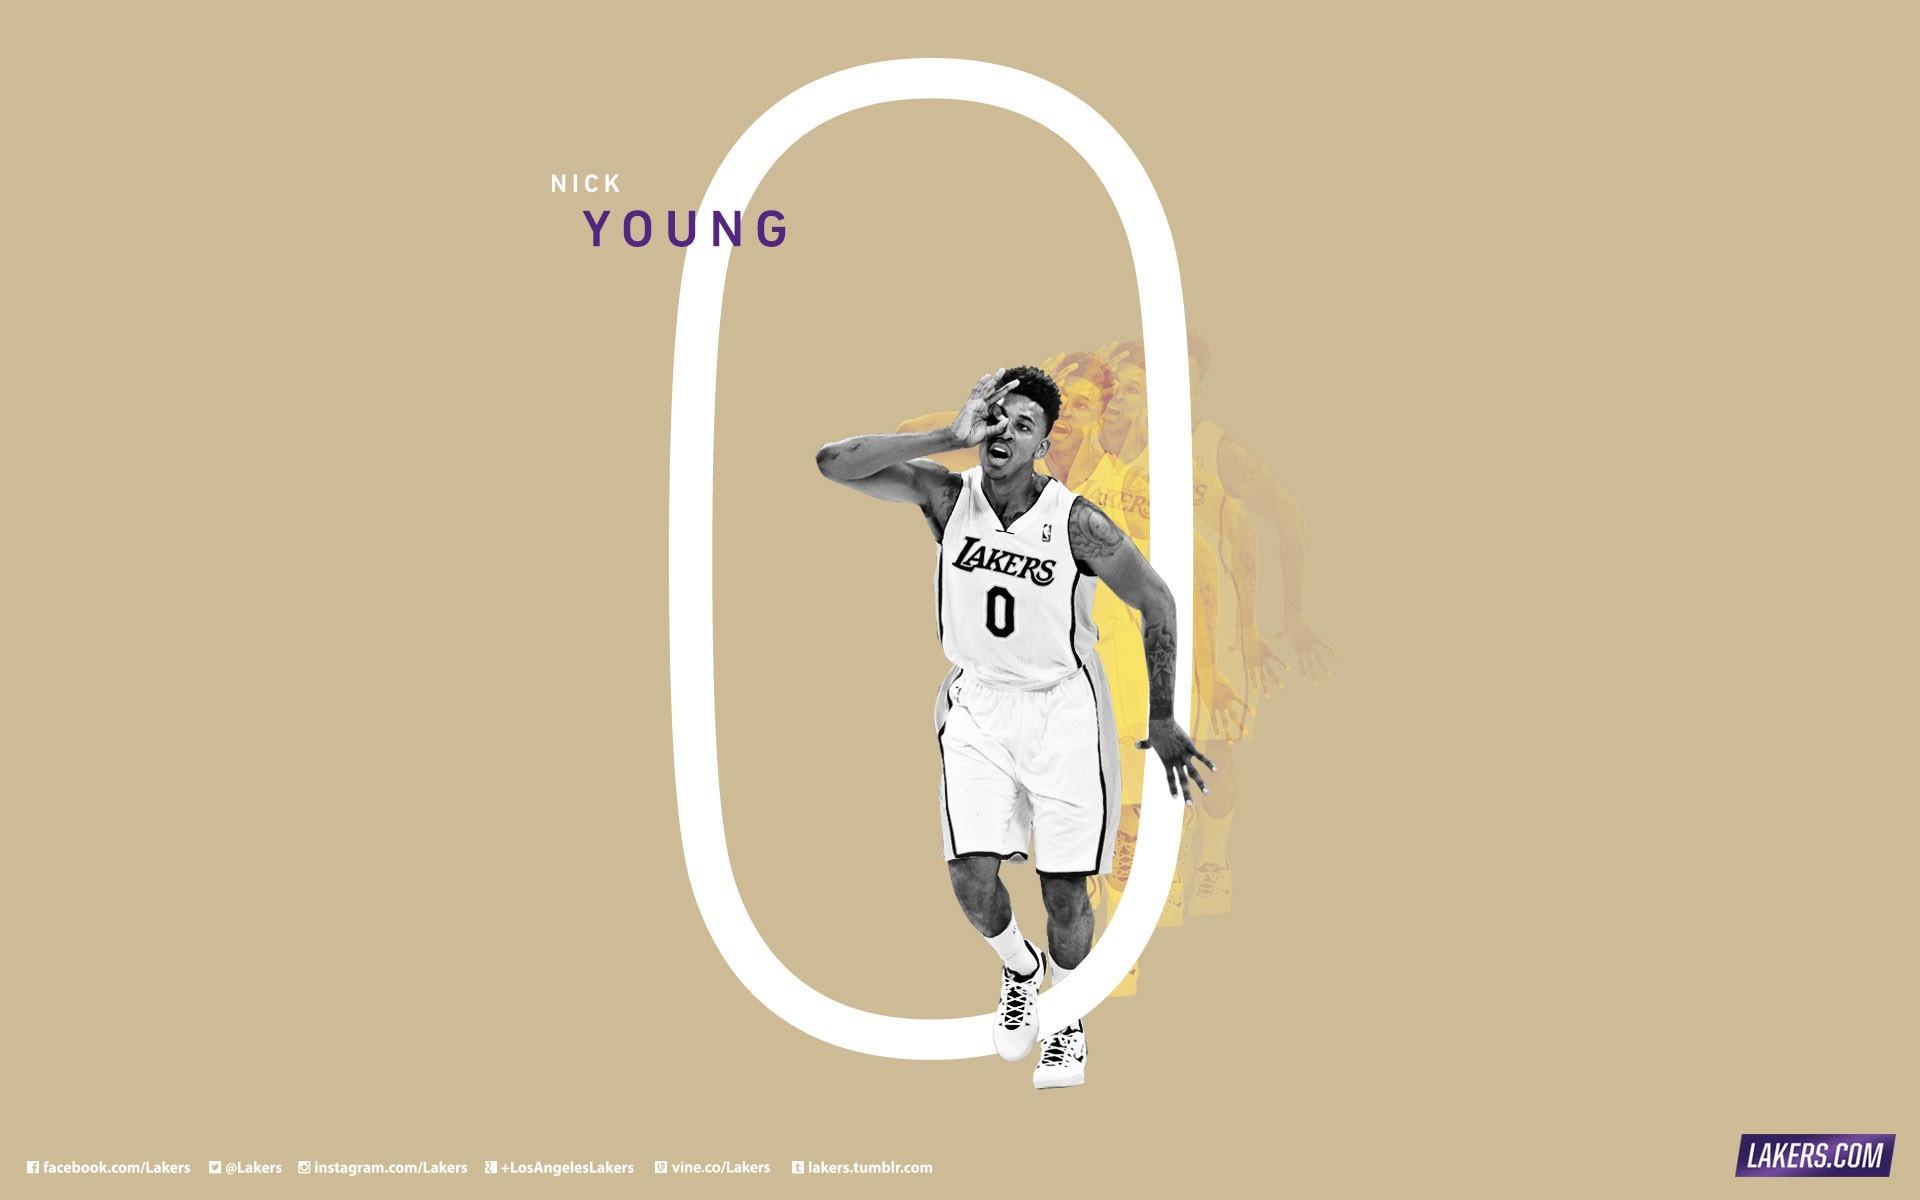 Nick Young 0 LA Lakers 2015 Wallpaper